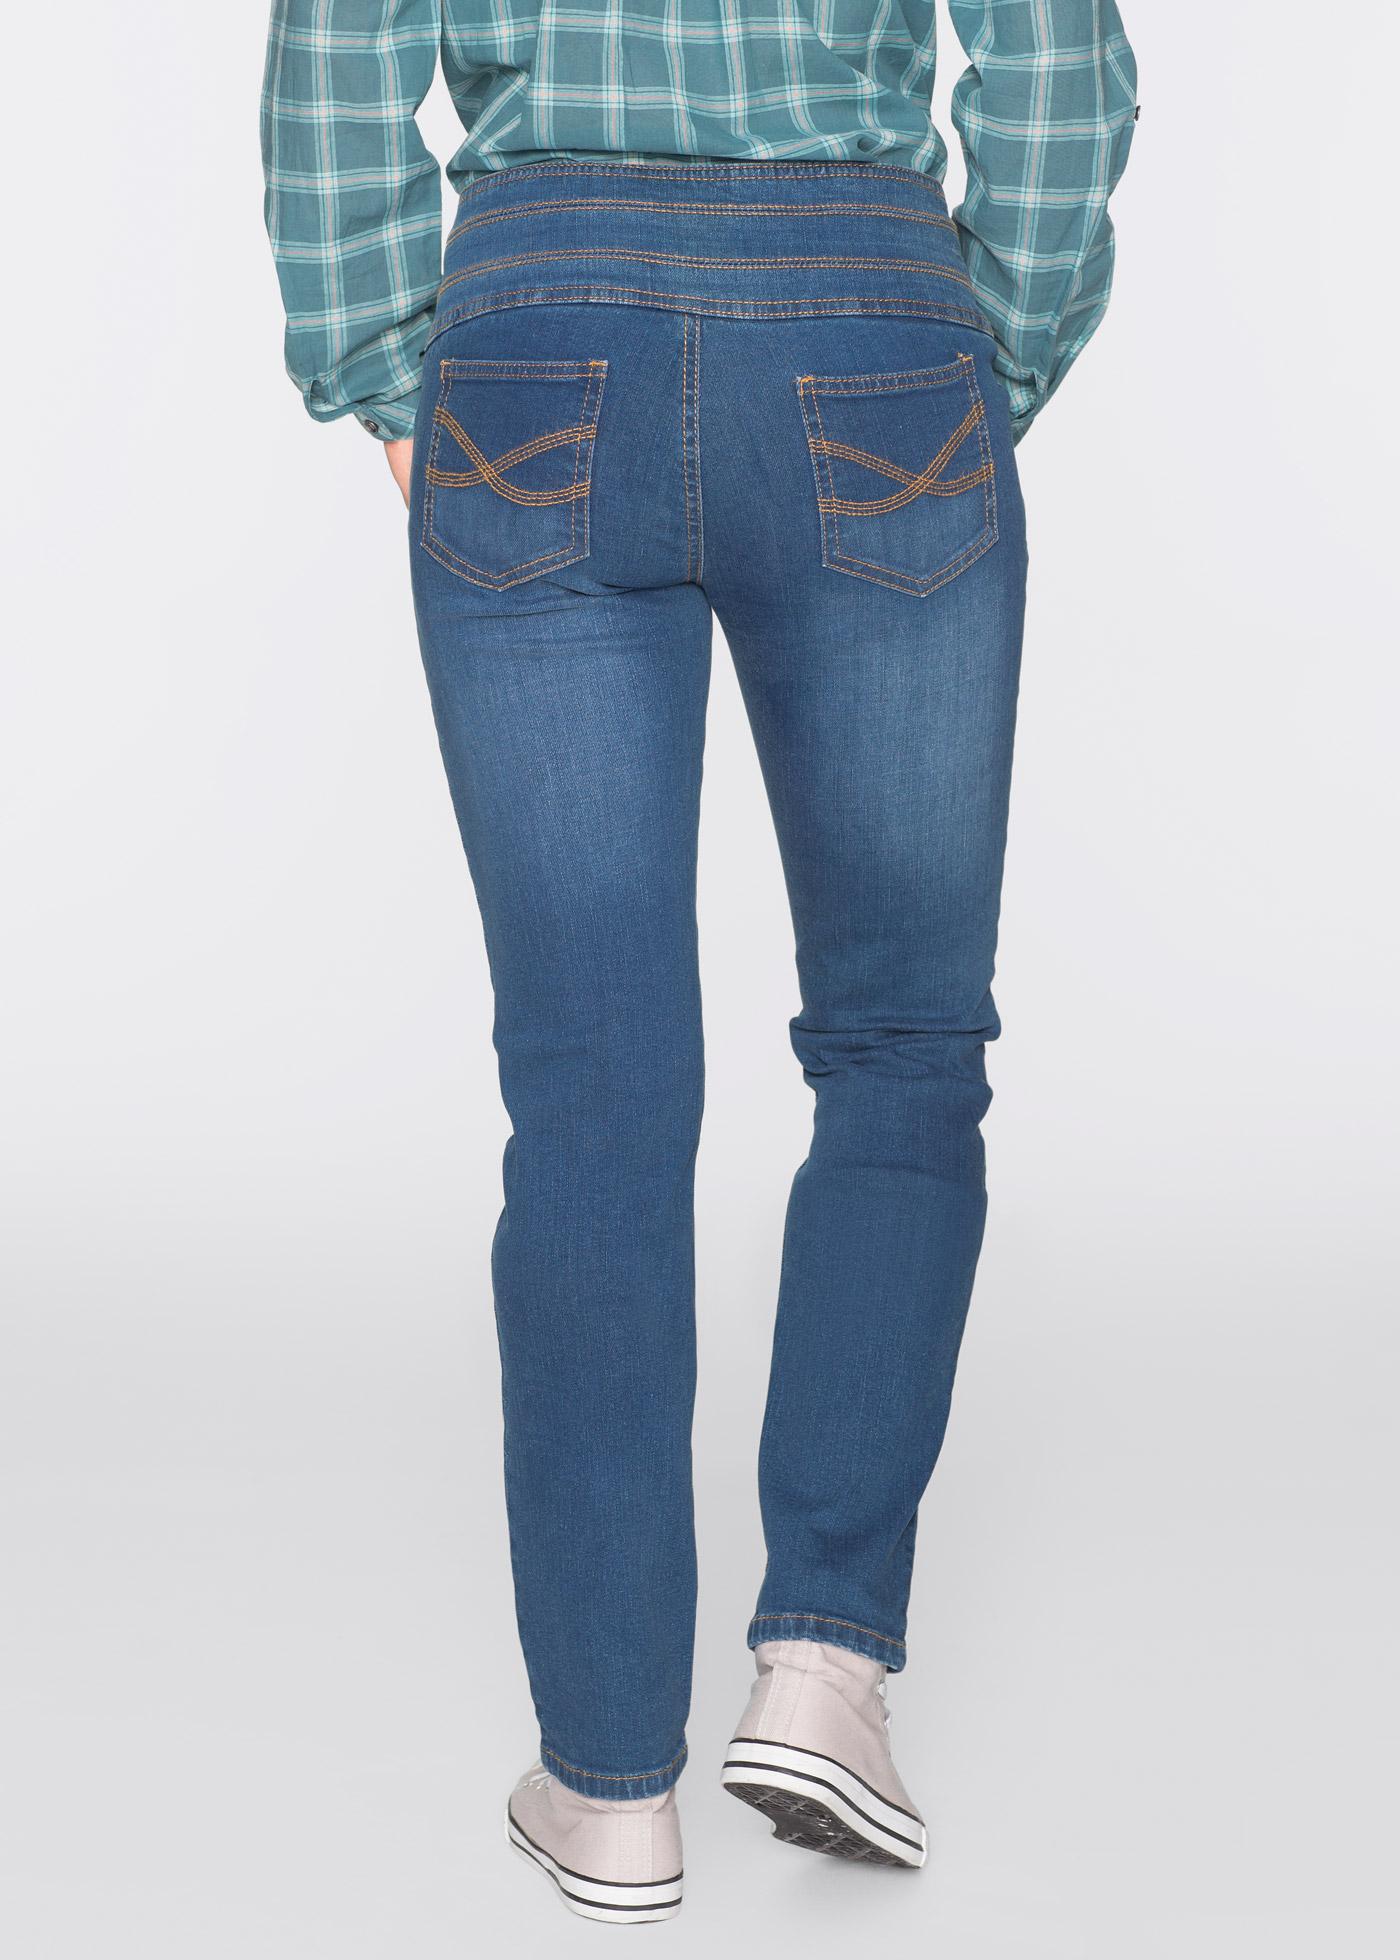 stretch jeans bauch weg r hre gr 44 schwarz damenjeans. Black Bedroom Furniture Sets. Home Design Ideas